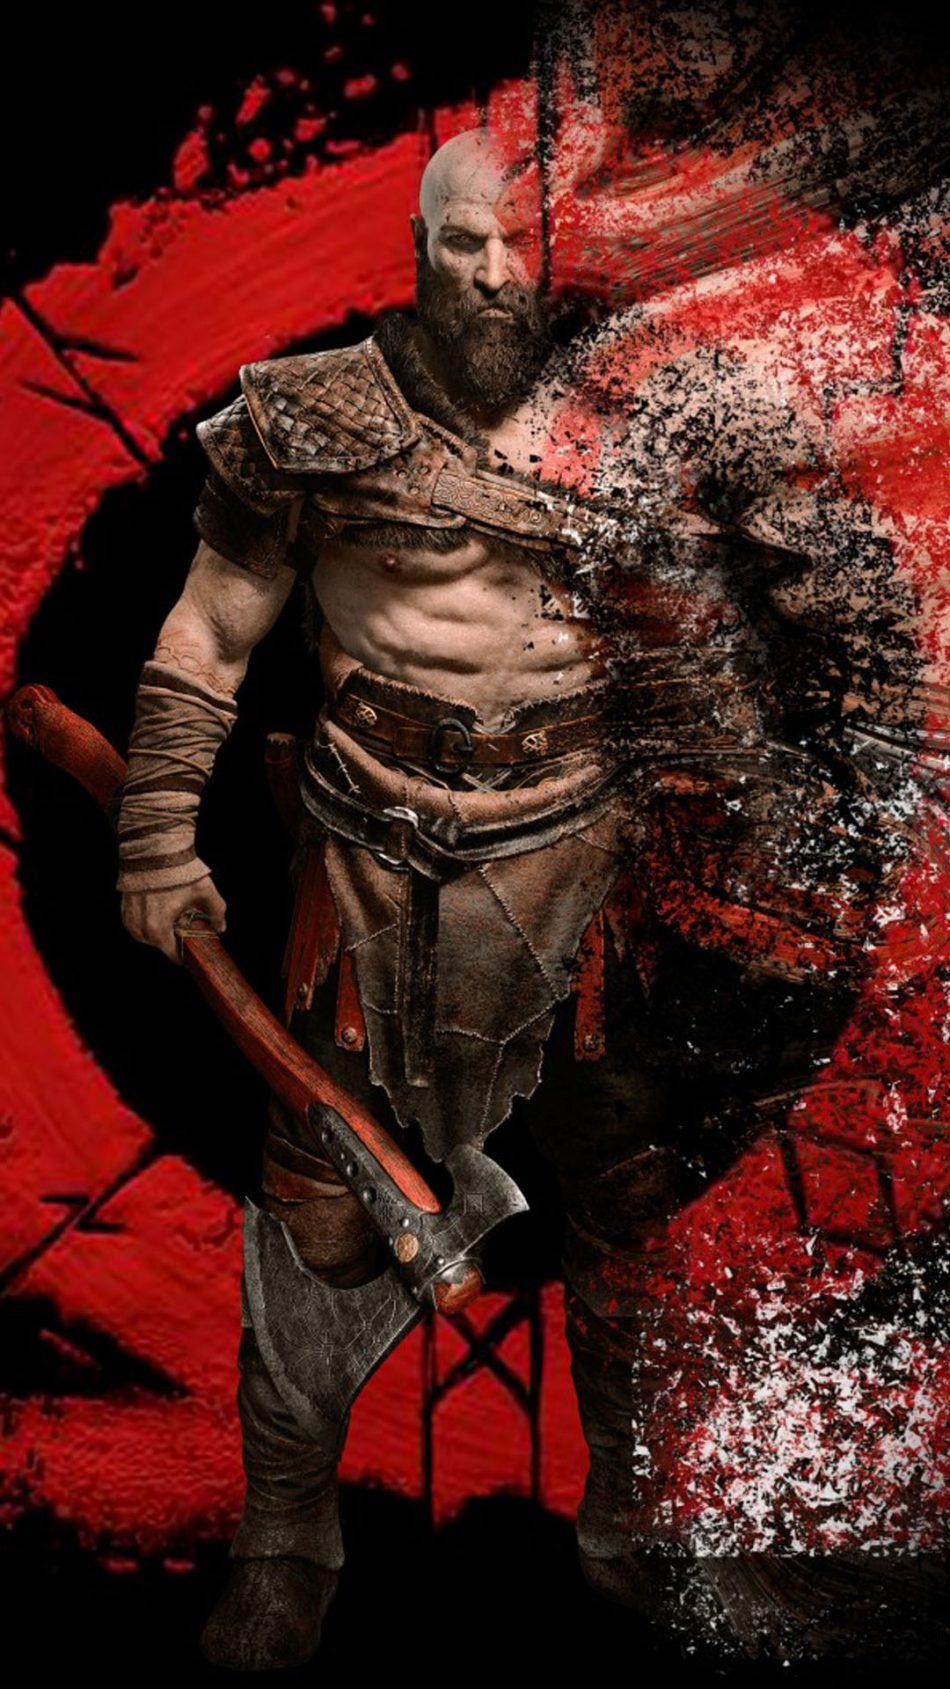 Kratos From God Of War Free 4k Ultra Hd Mobile Wallpaper